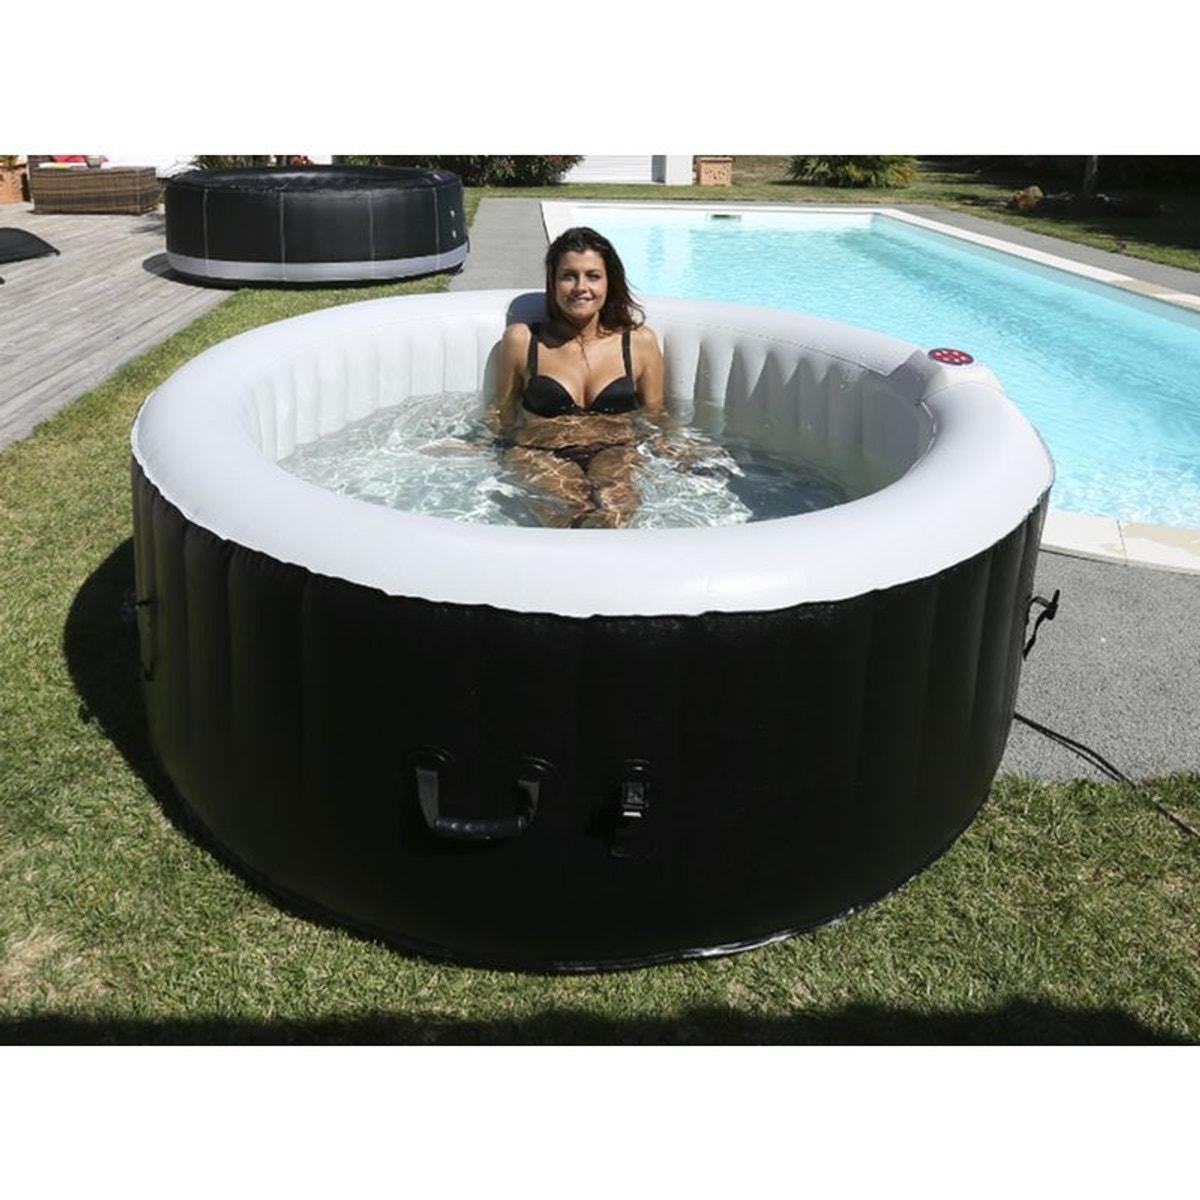 Spa Gonflable Laminee 6 Personnes Gonflage En 5 Minutes Taille Taille Unique Products En 2019 Spa Gonflable Jacuzzi Et Spa